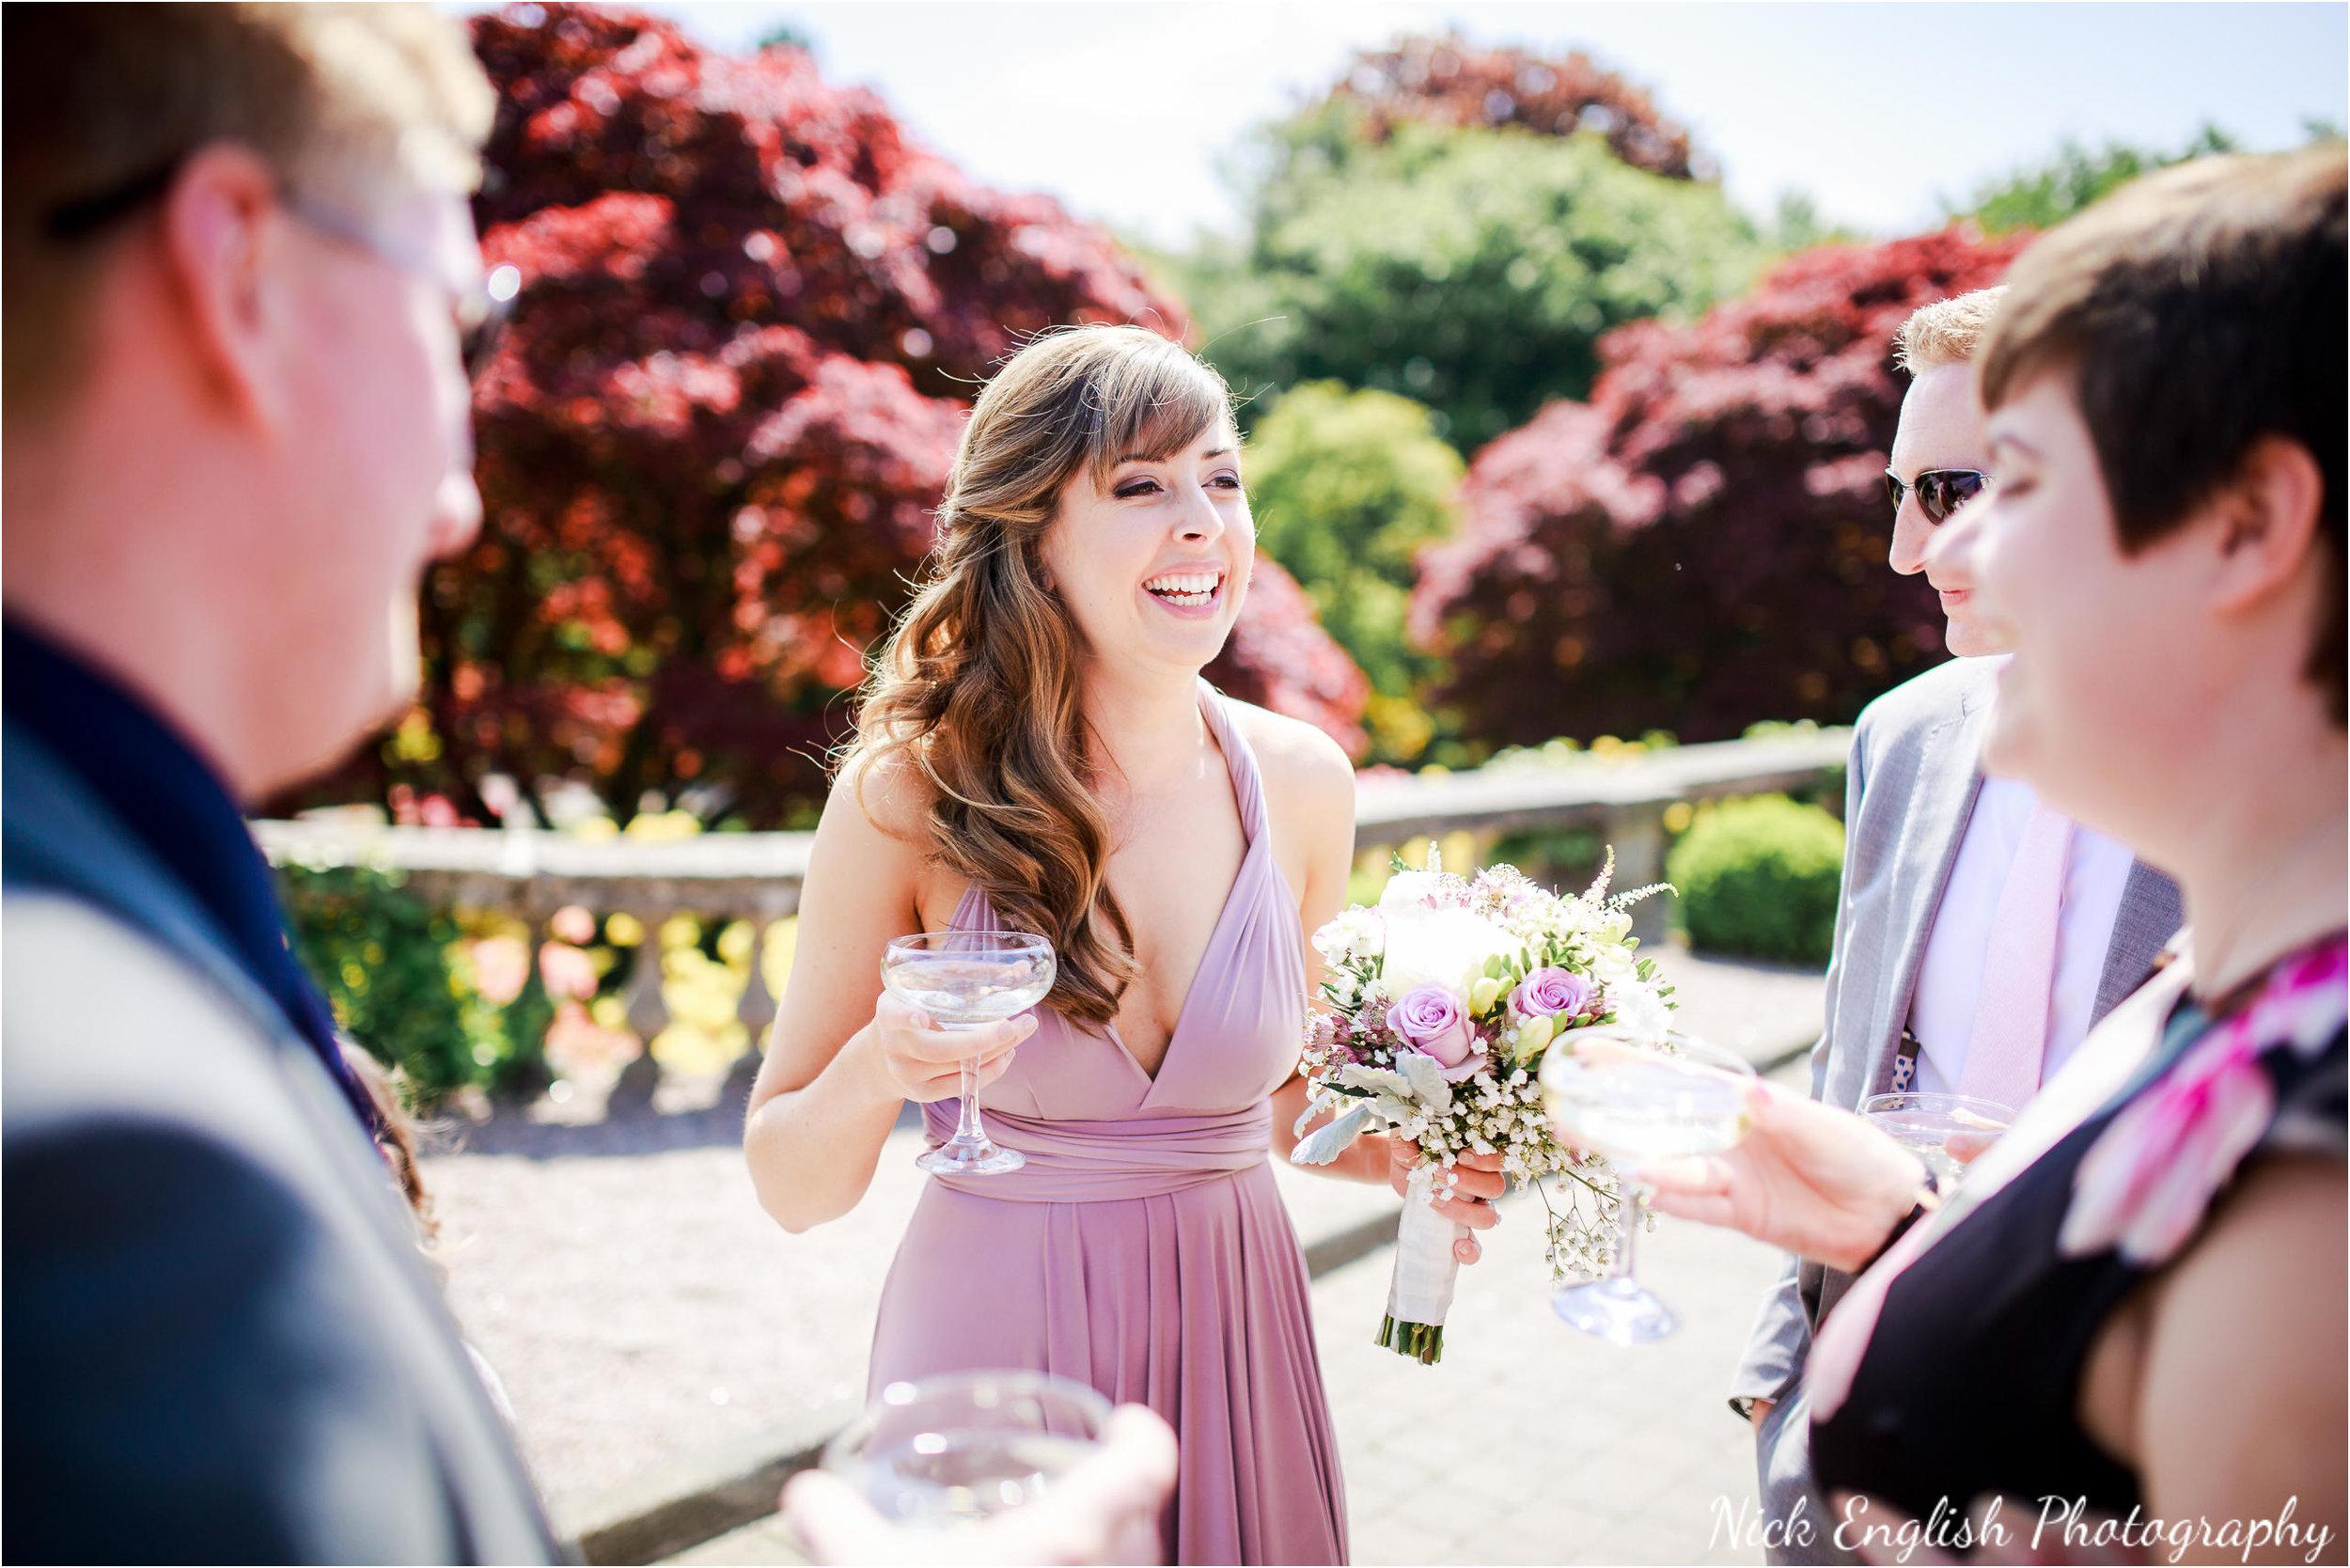 Alison James Wedding Photographs at Eaves Hall West Bradford 114jpg.jpeg